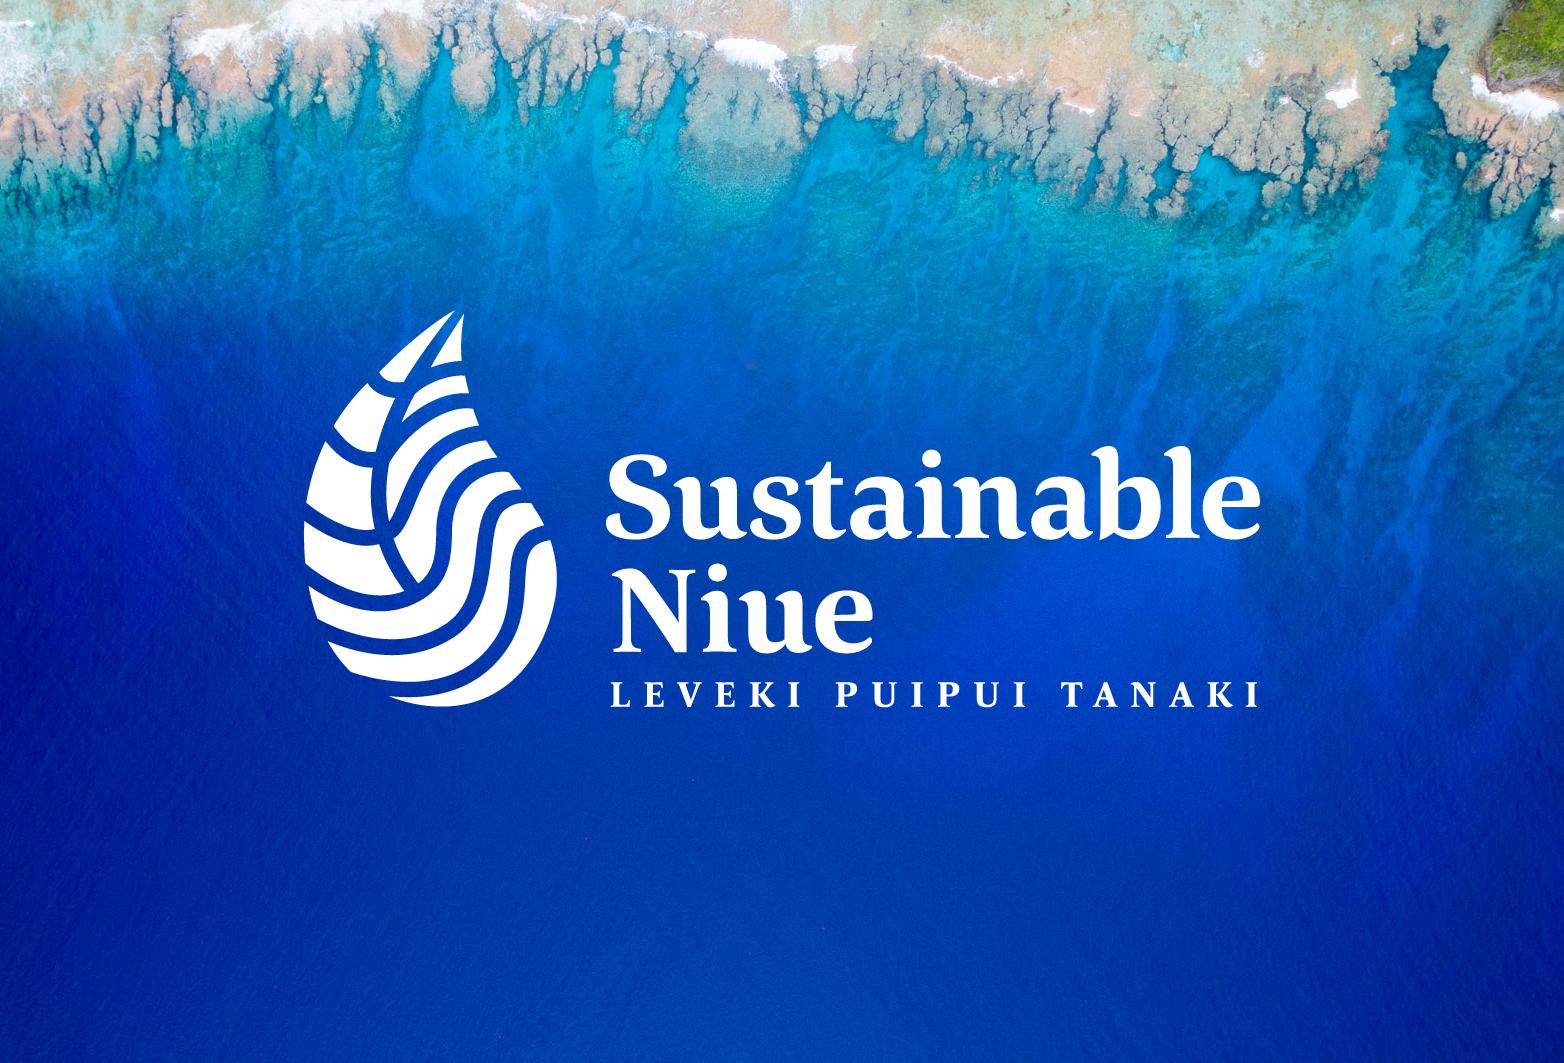 SustainableNiue.jpg